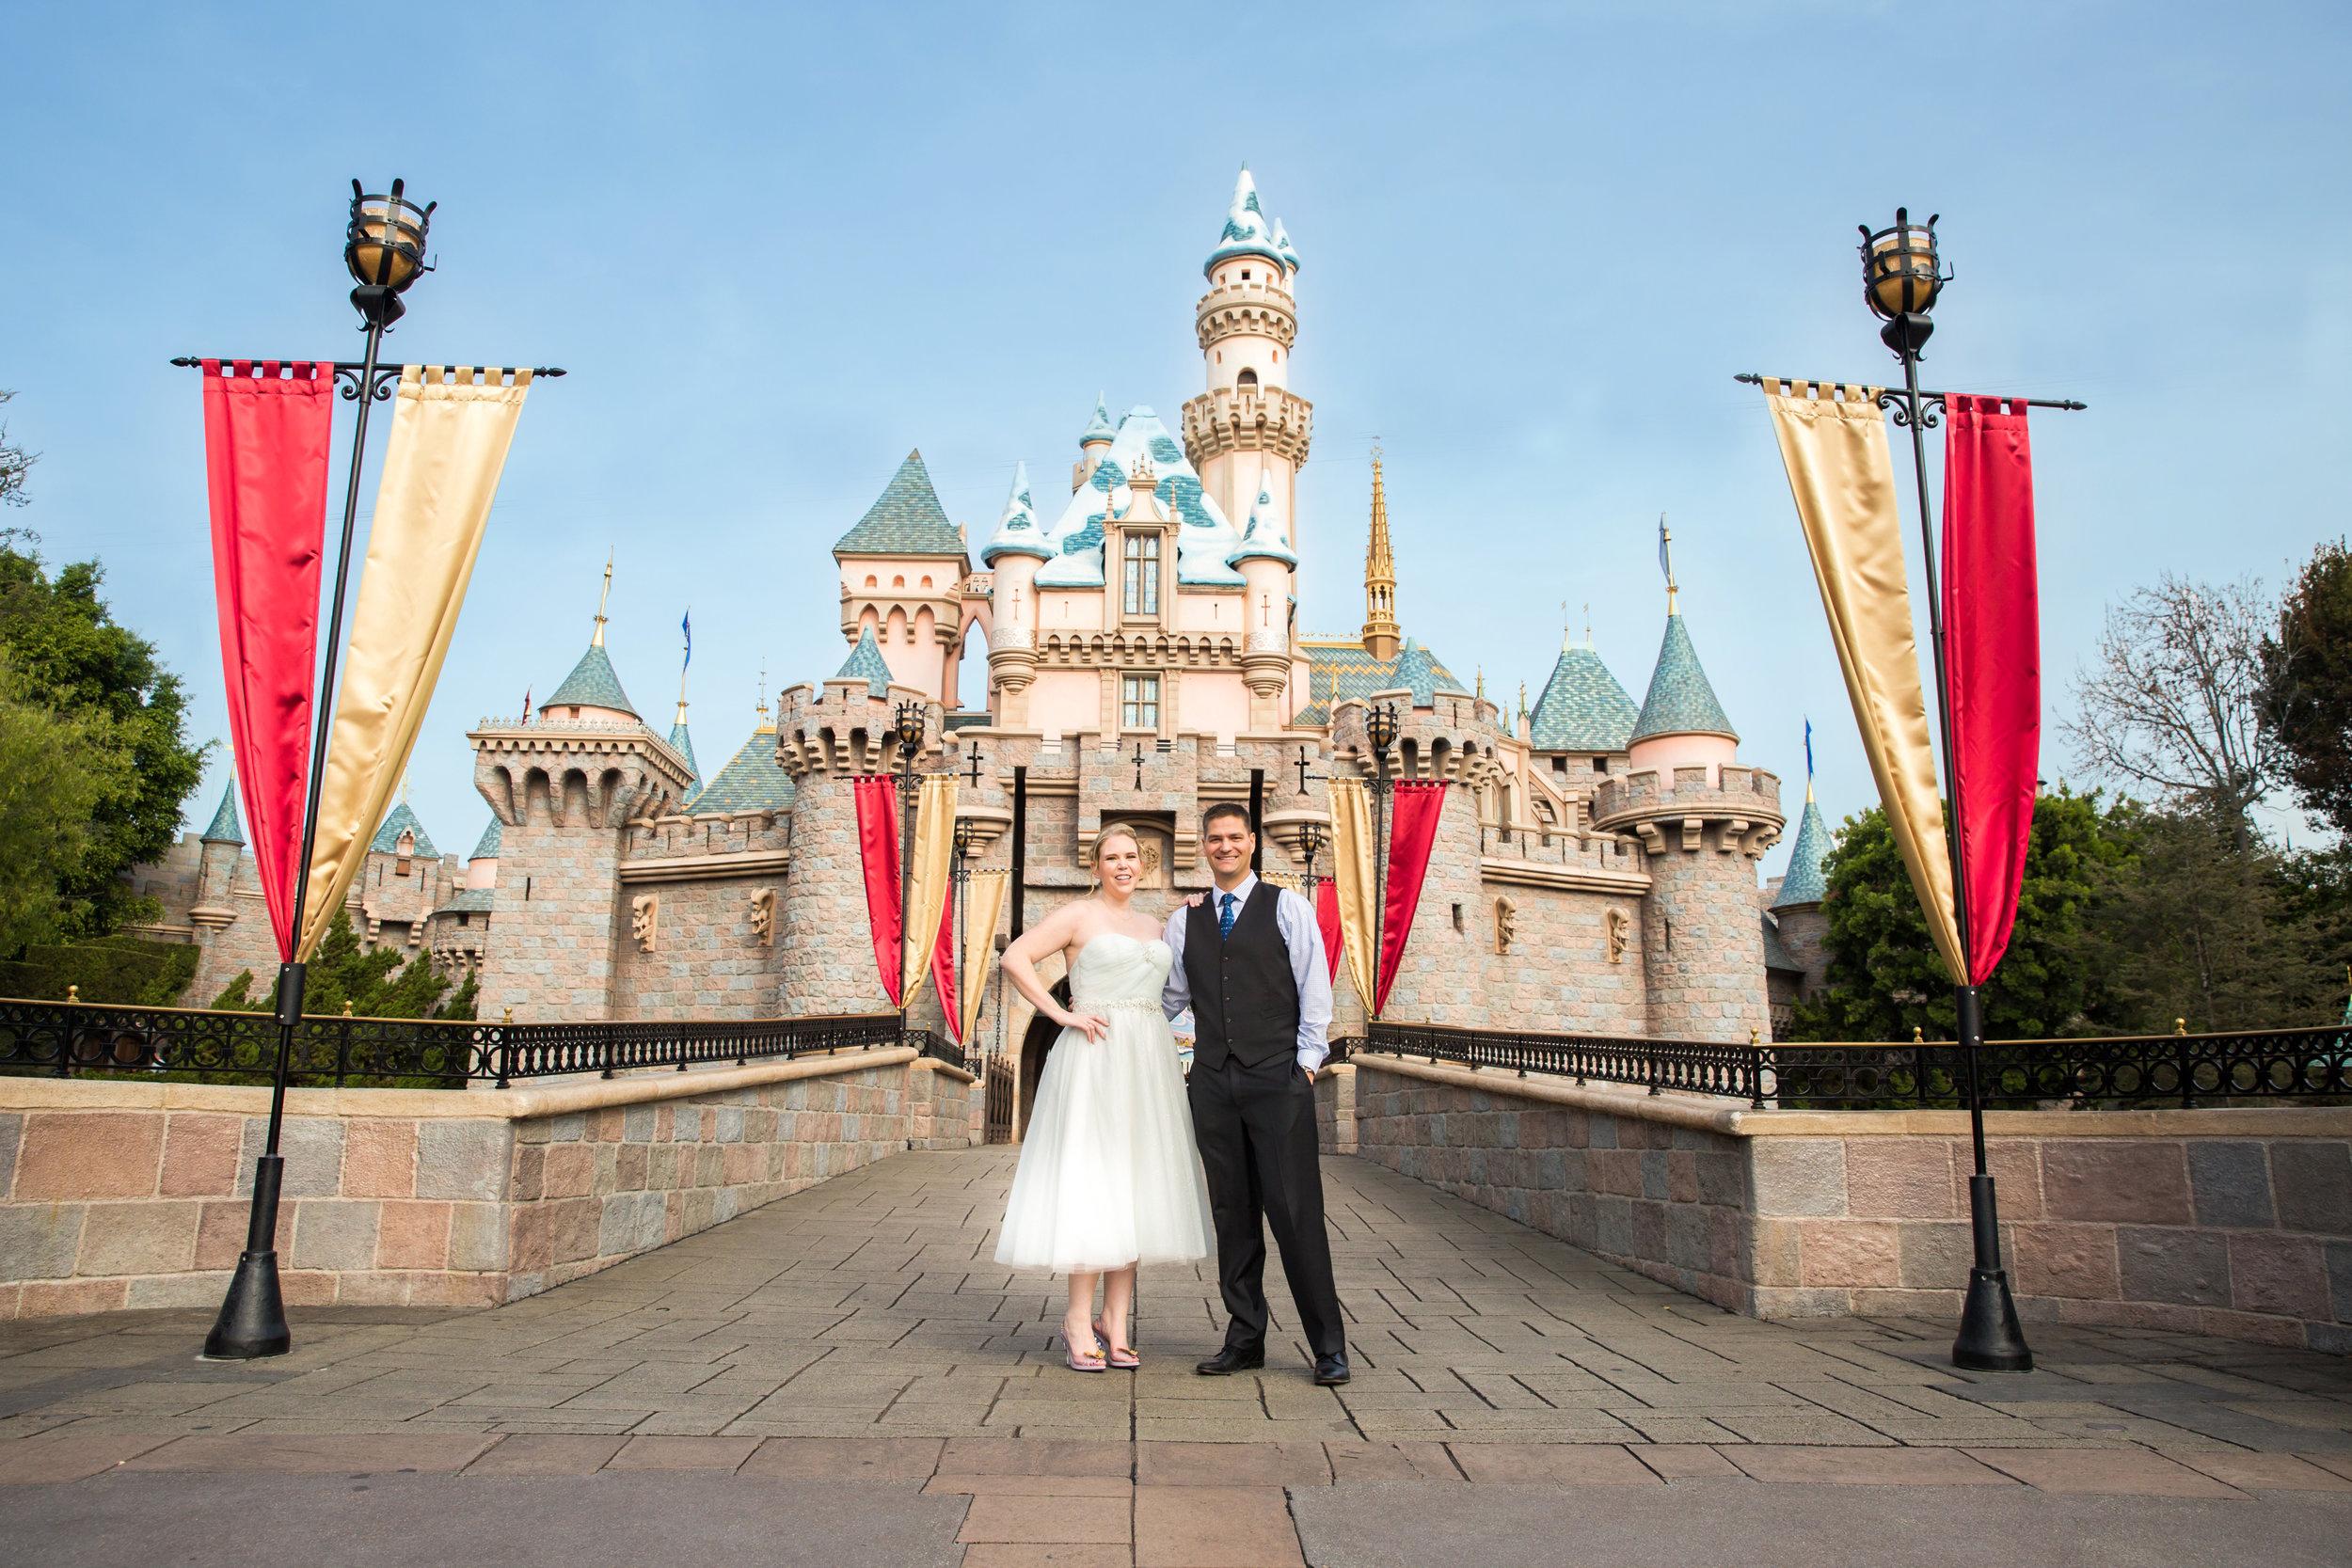 Disney_Dinks_Disneyland_Castle.jpg